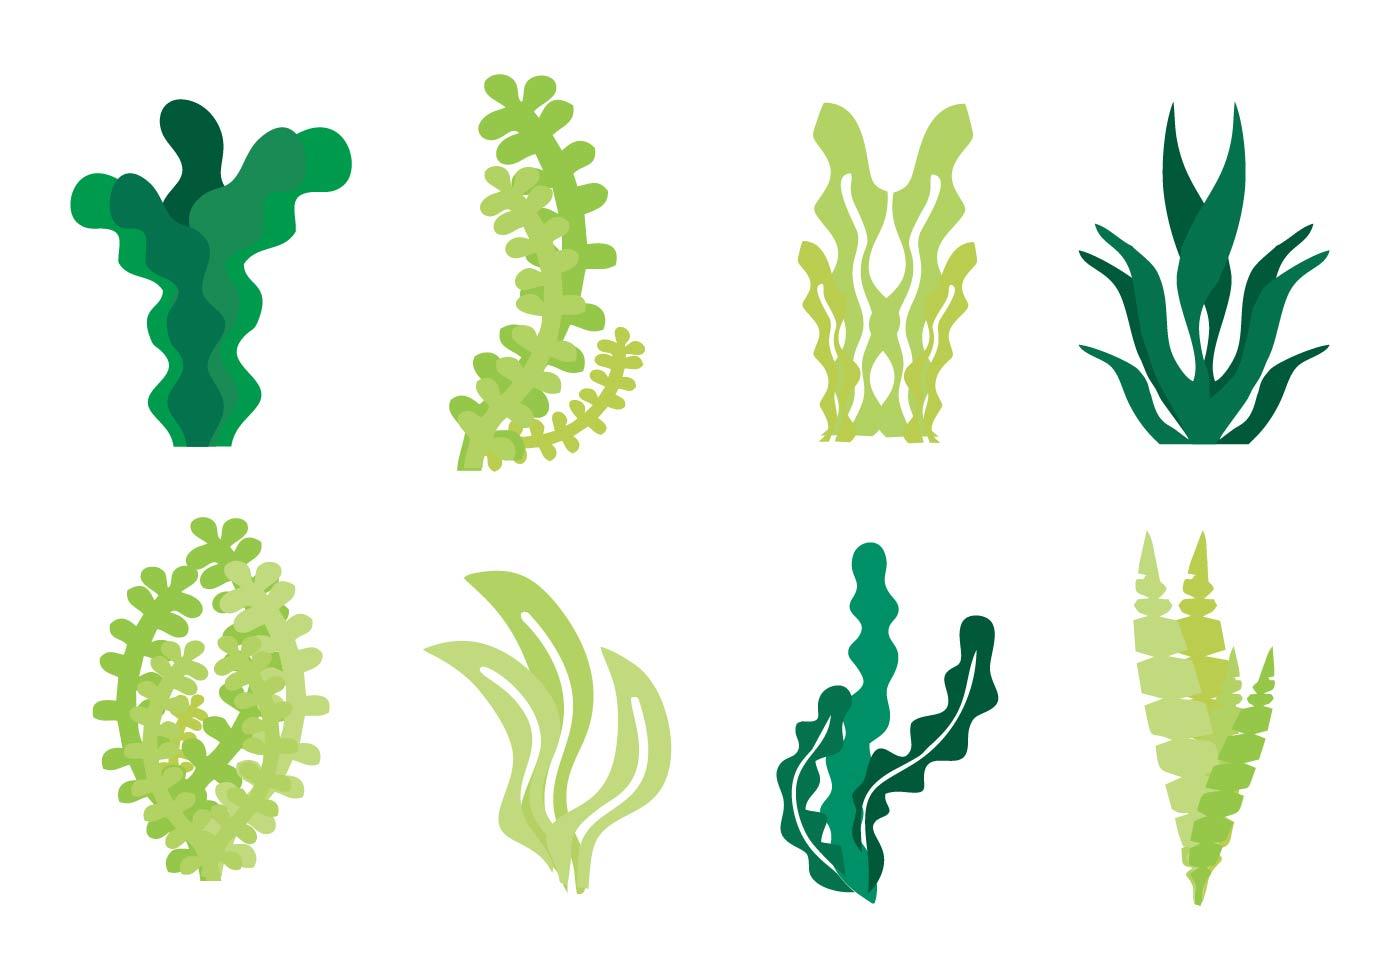 seaweed free vector art 4761 free downloads rh vecteezy com seaweed vector free seaweed texture vector